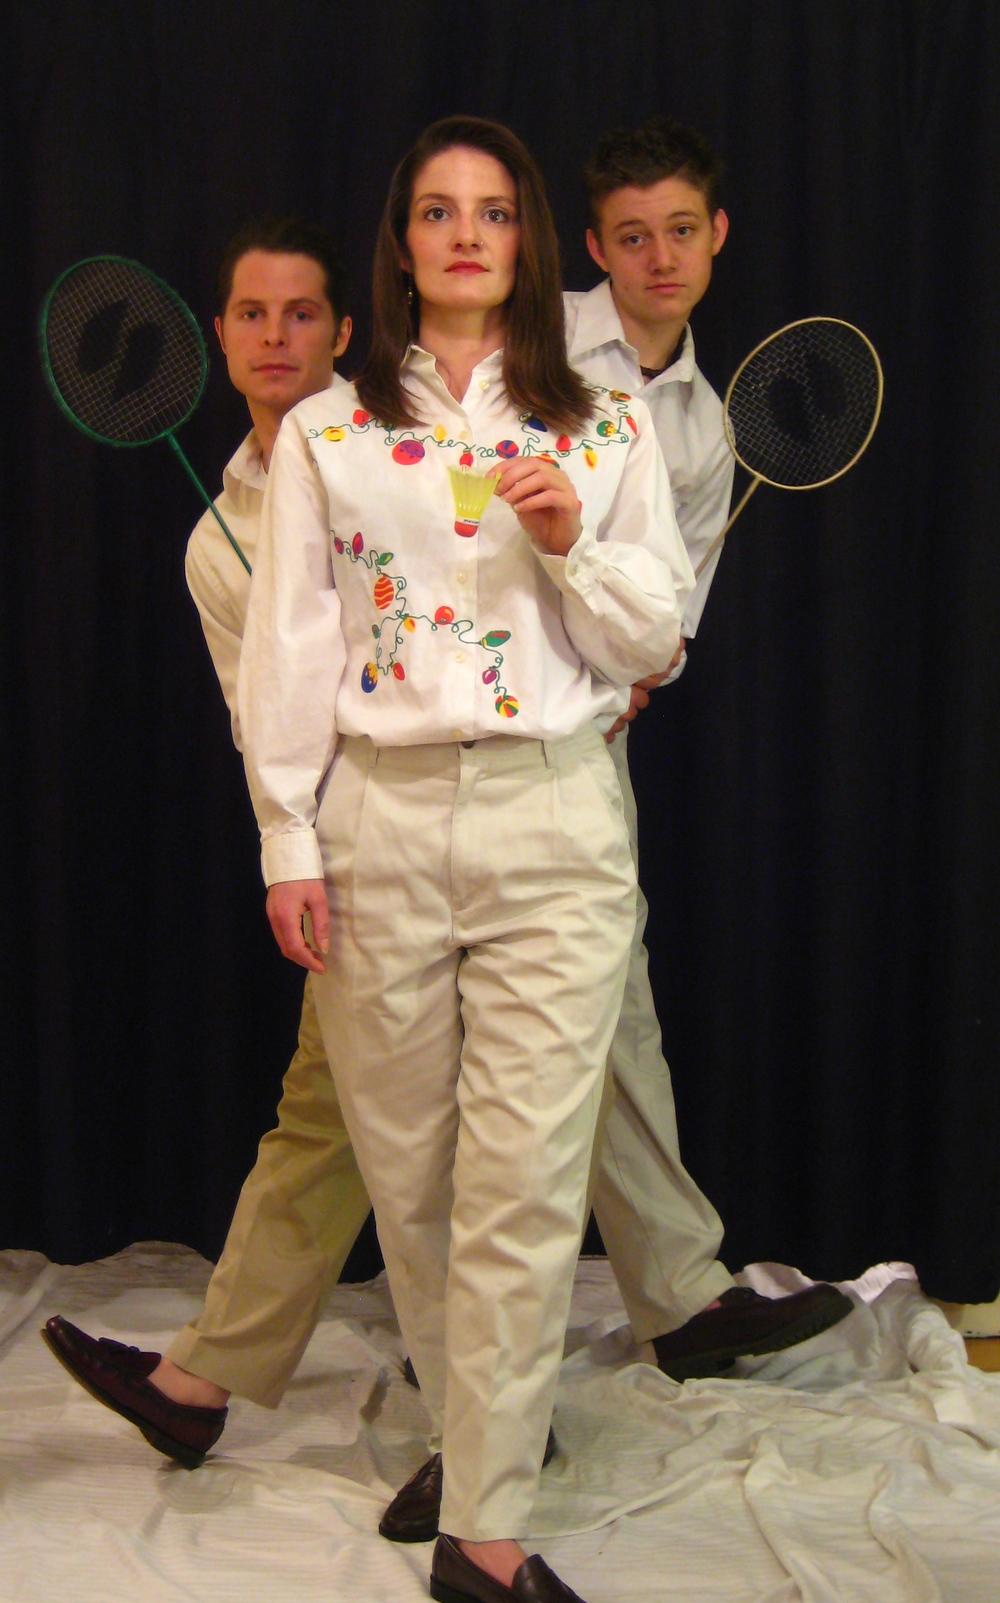 badminton5.jpg